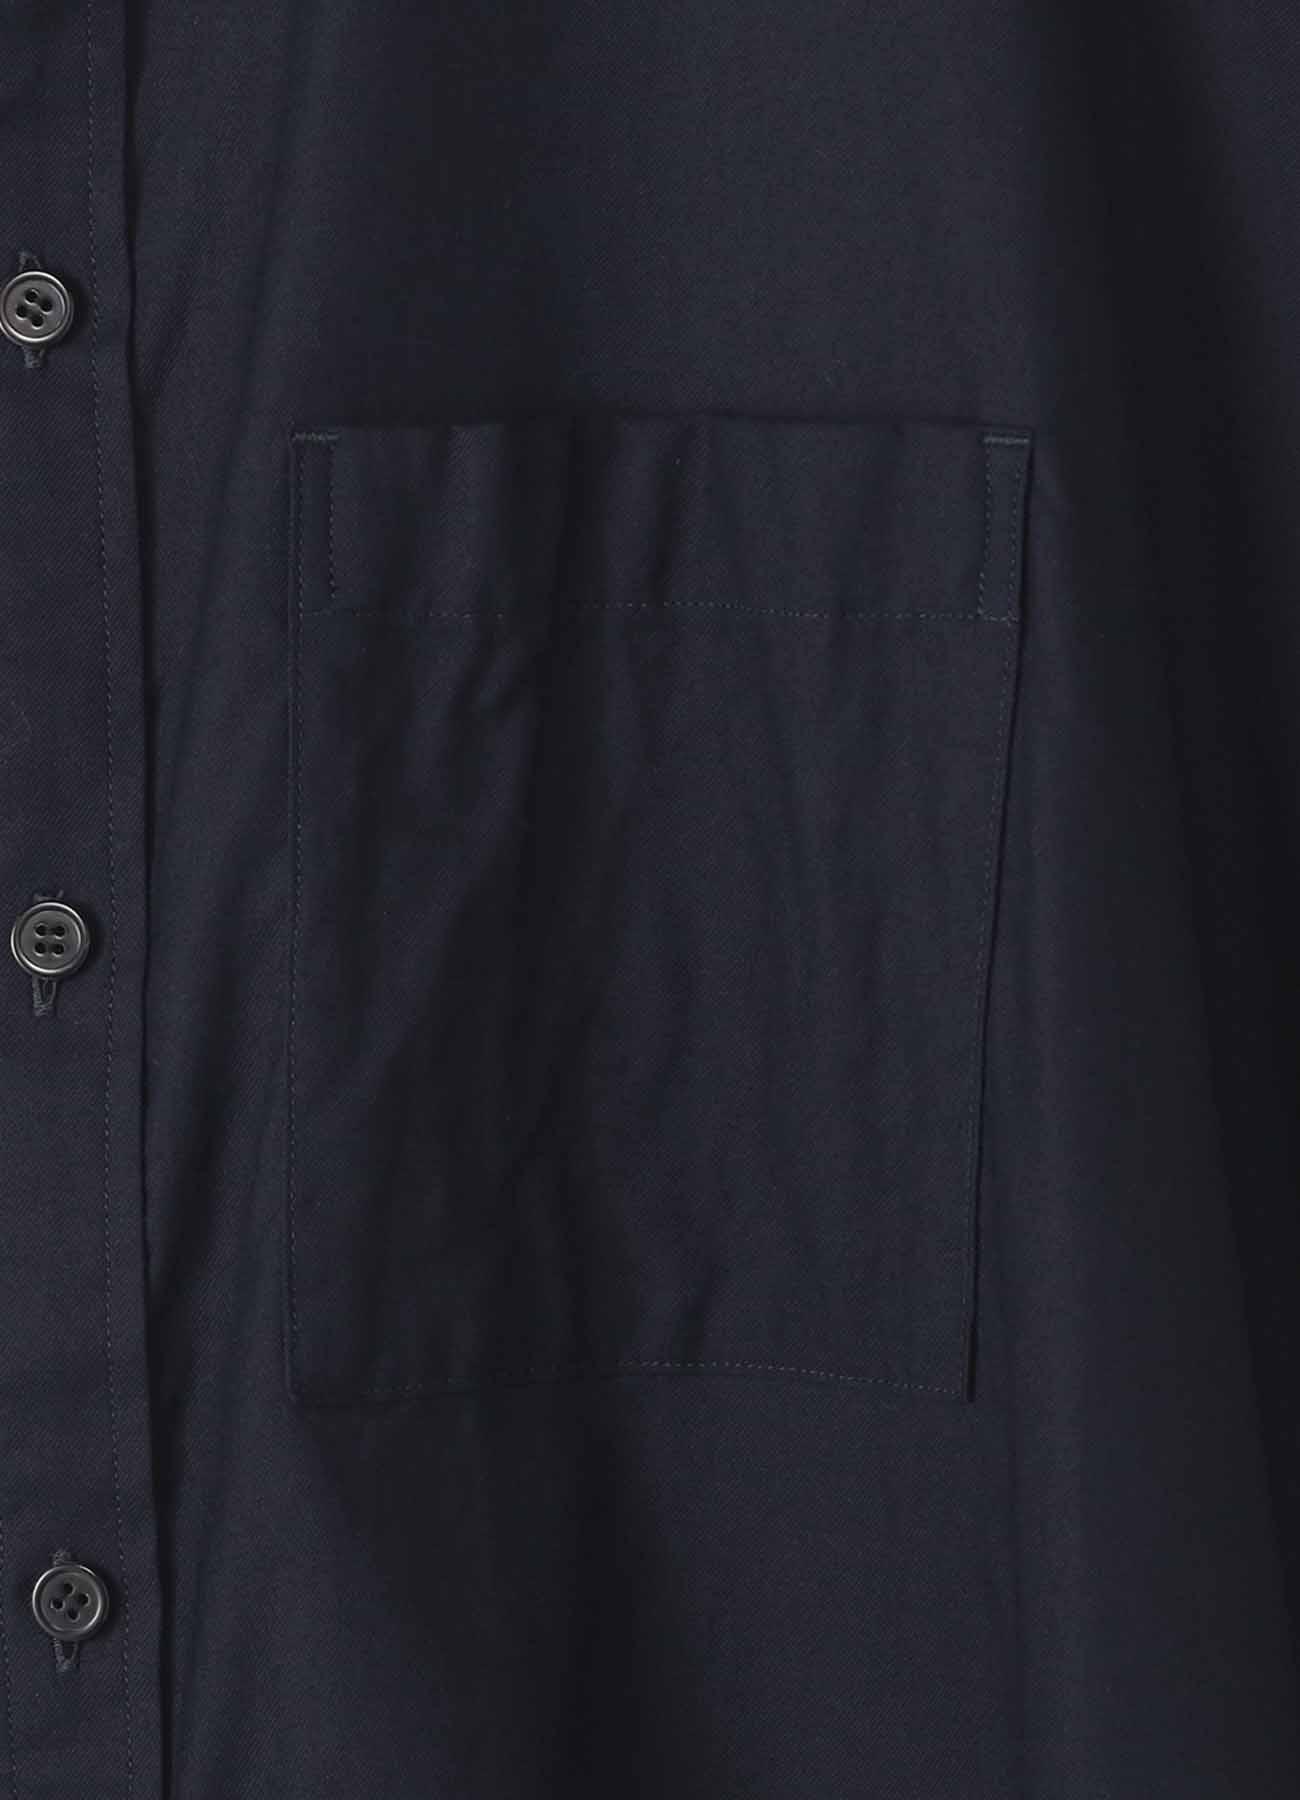 Y's-BORN PRODUCT薄棉质斜纹卷边大上衣